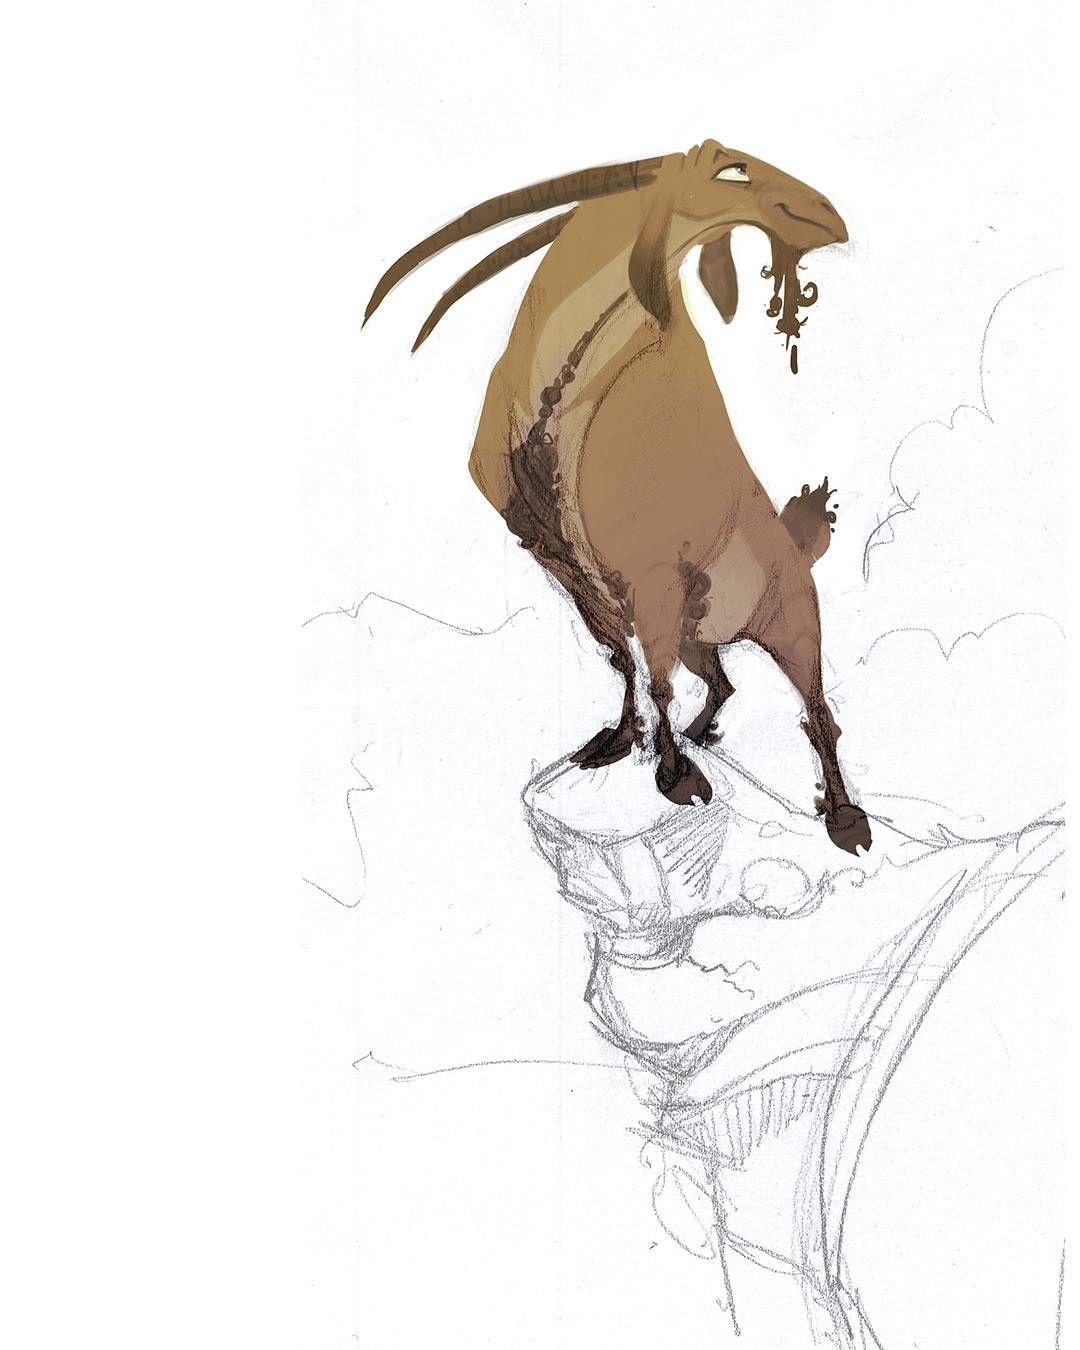 #characterdesign #art #animation #MHD_kheirandish #MHD_kheirandish_art #animationdrawing  #illustrate #drawing #goat